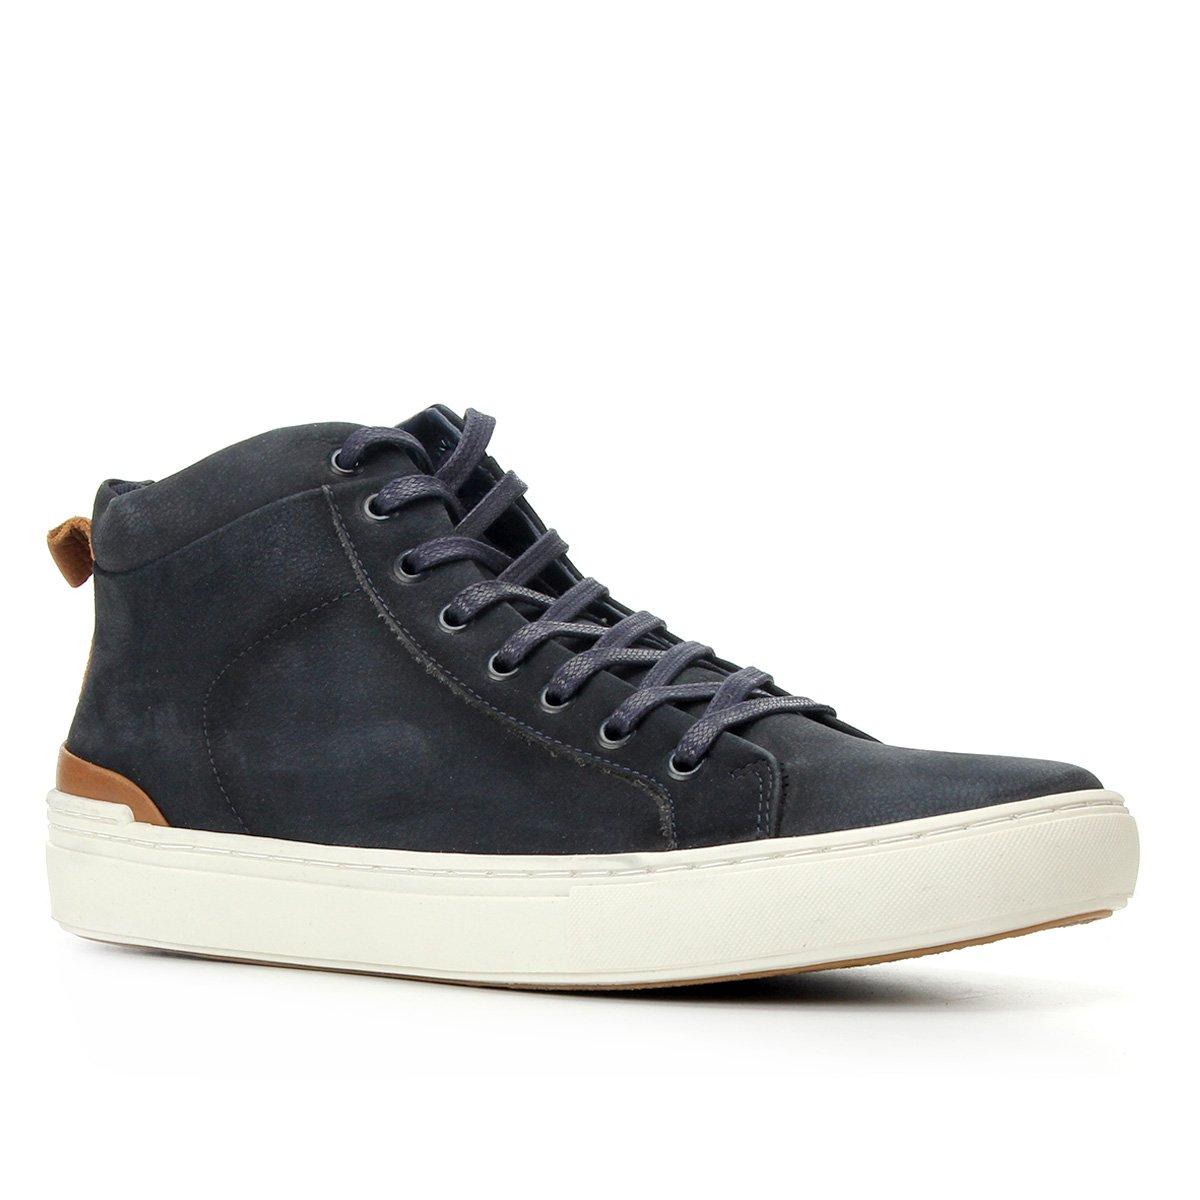 Sapatênis Couro Shoestock Cano Alto Masculino